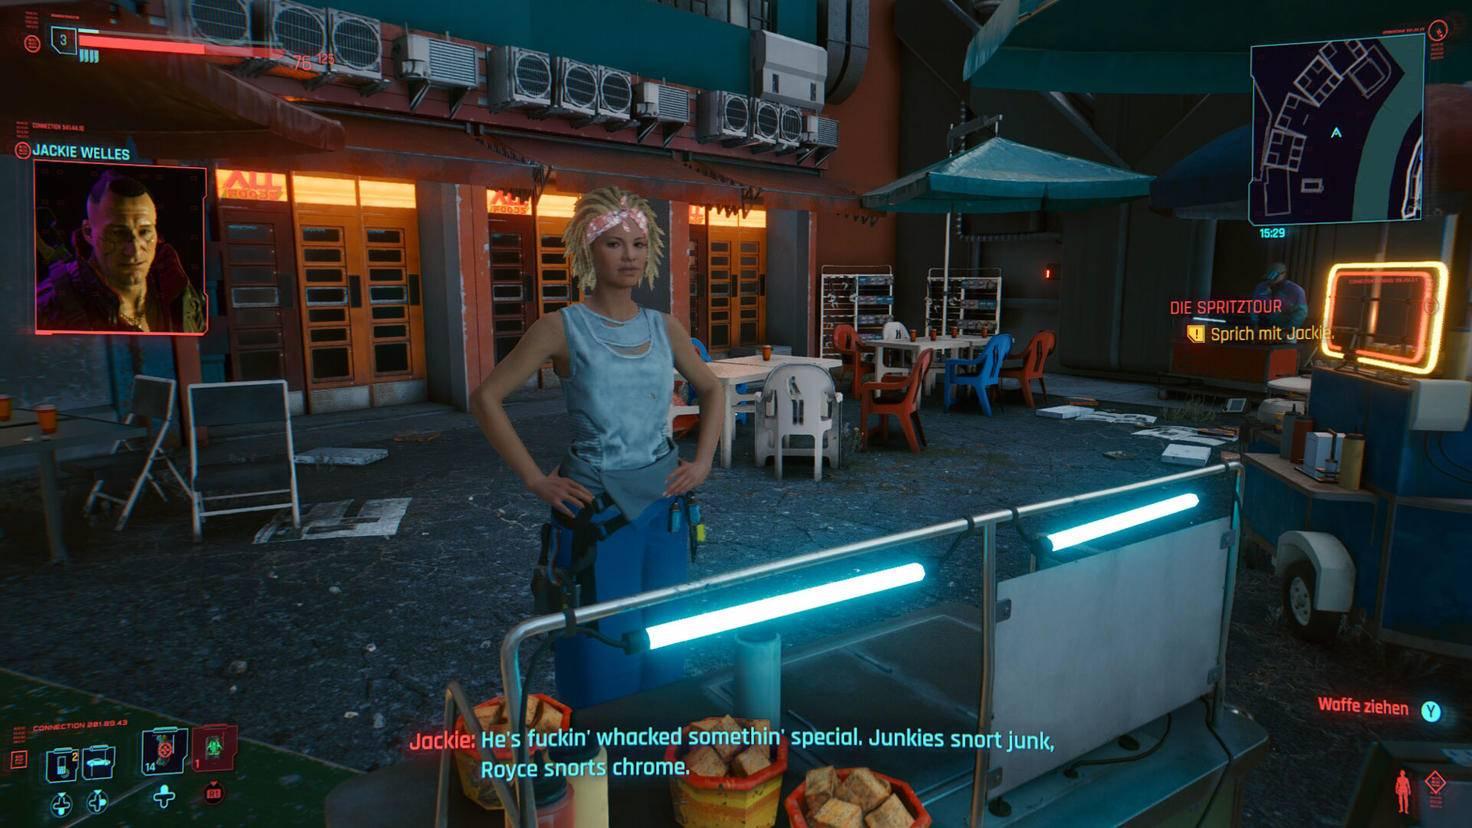 cyberpunk-2077-stadia-screenshot-02